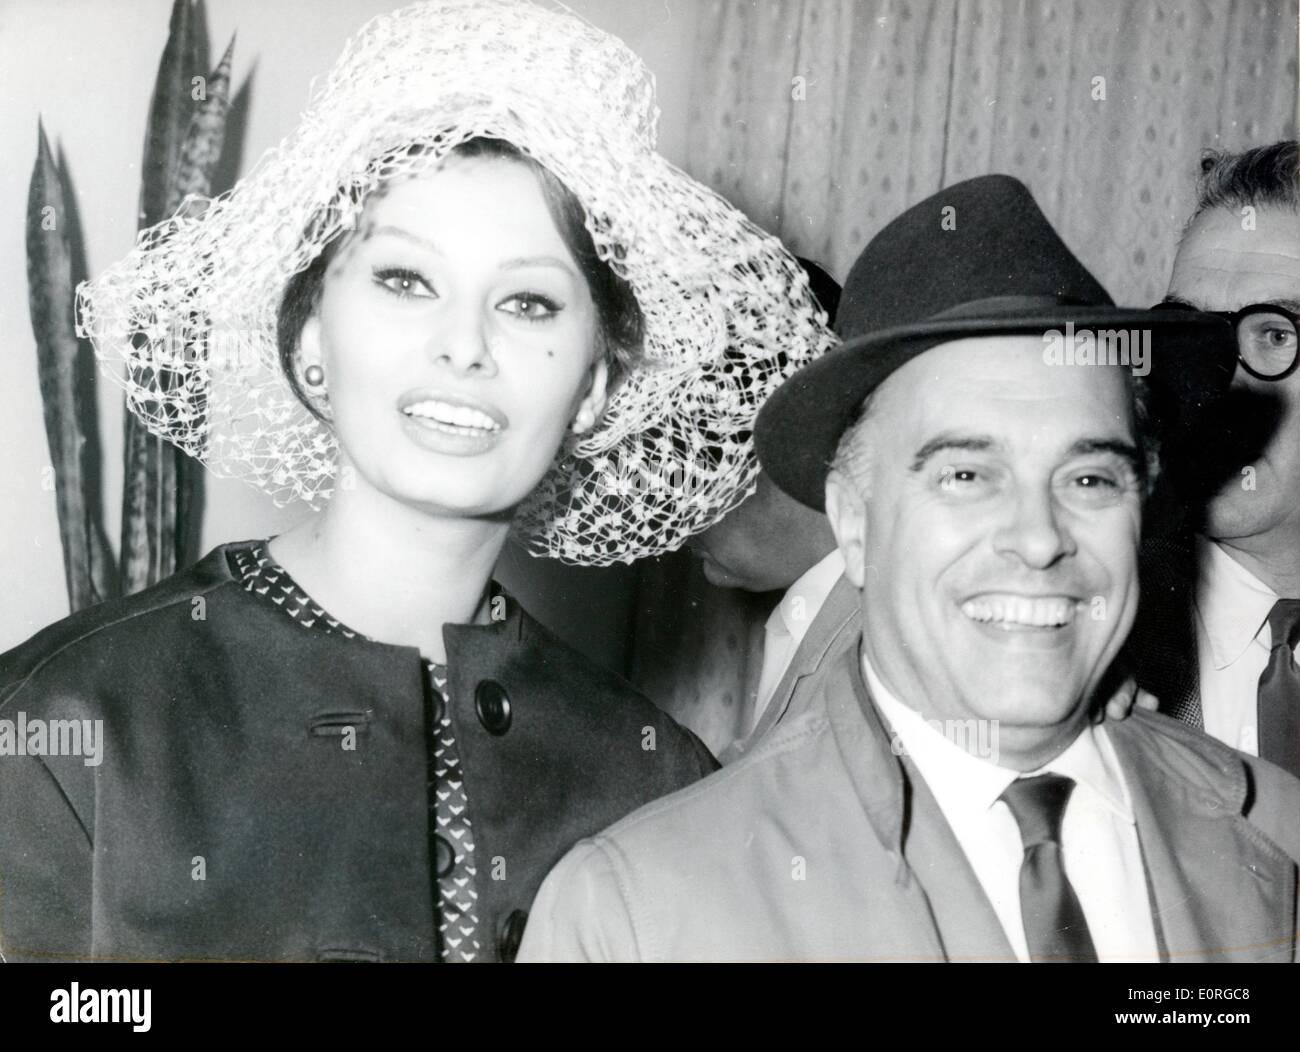 Velika ljubav: Sophia Loren i Carlo Ponti Sophia-loren-and-husband-carlo-ponti-arriving-at-the-tempelhof-airport-E0RGC8